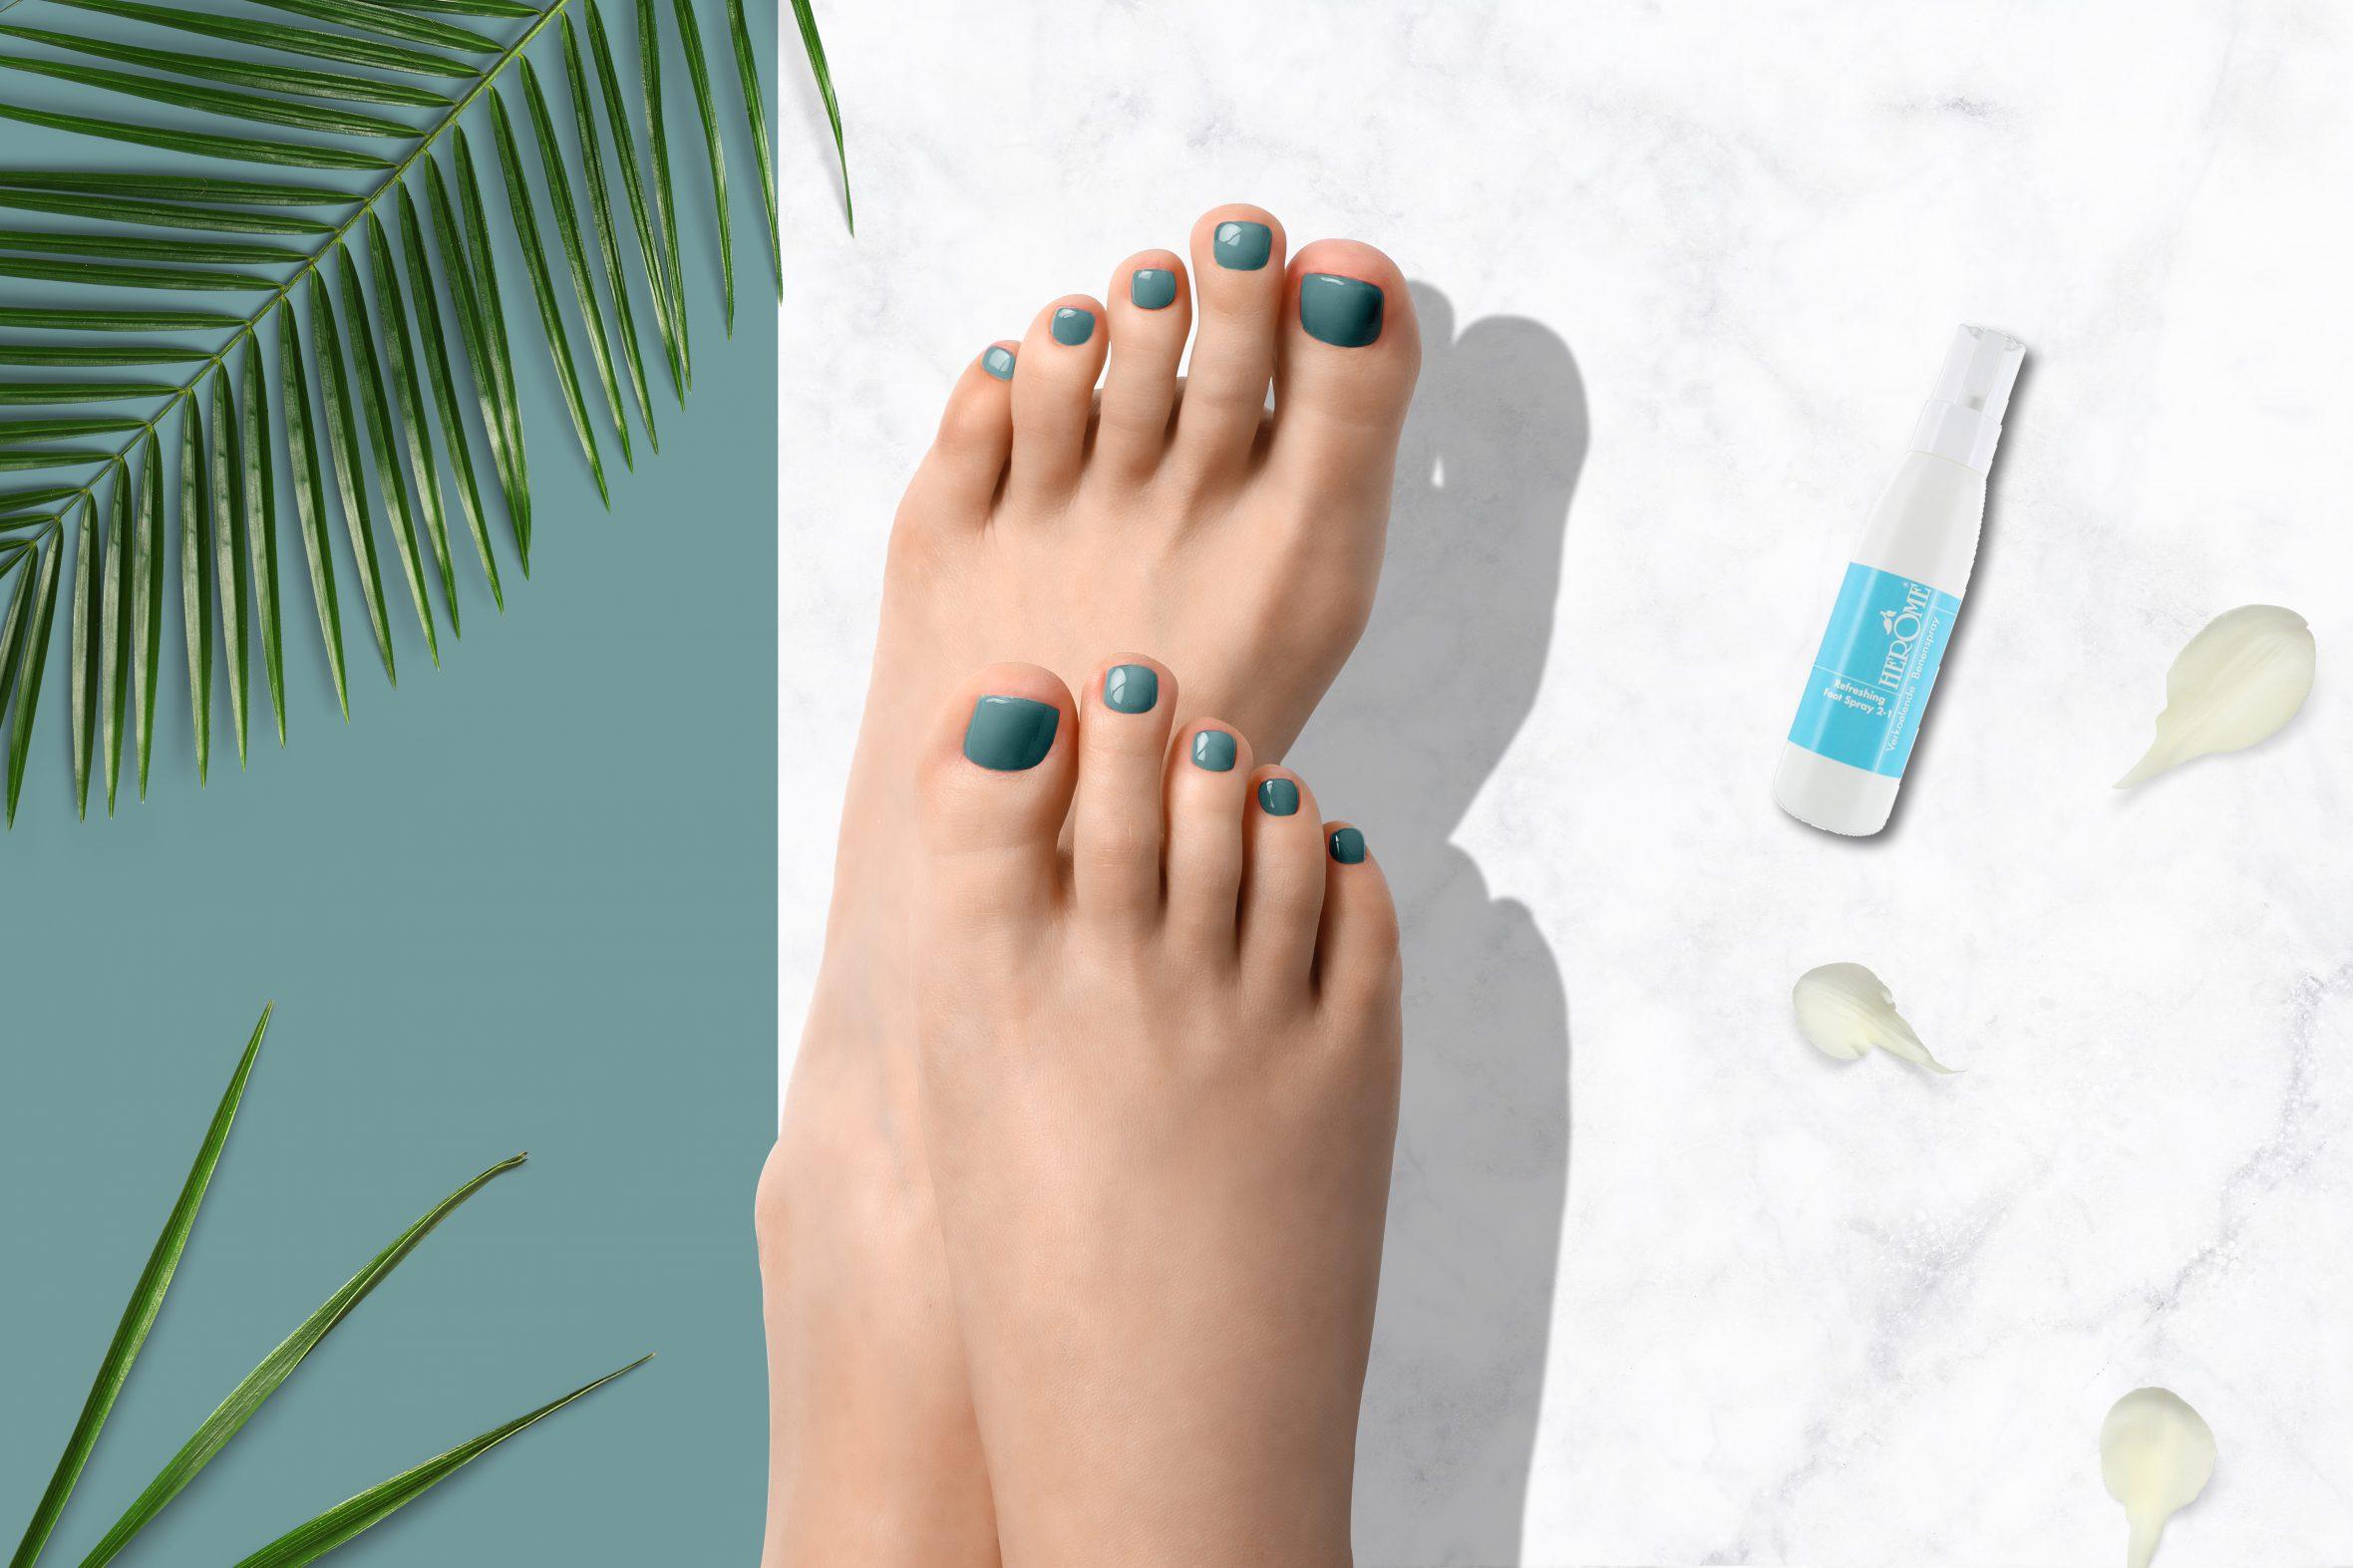 turquoise blauwe nagellak voor zomerse pediure